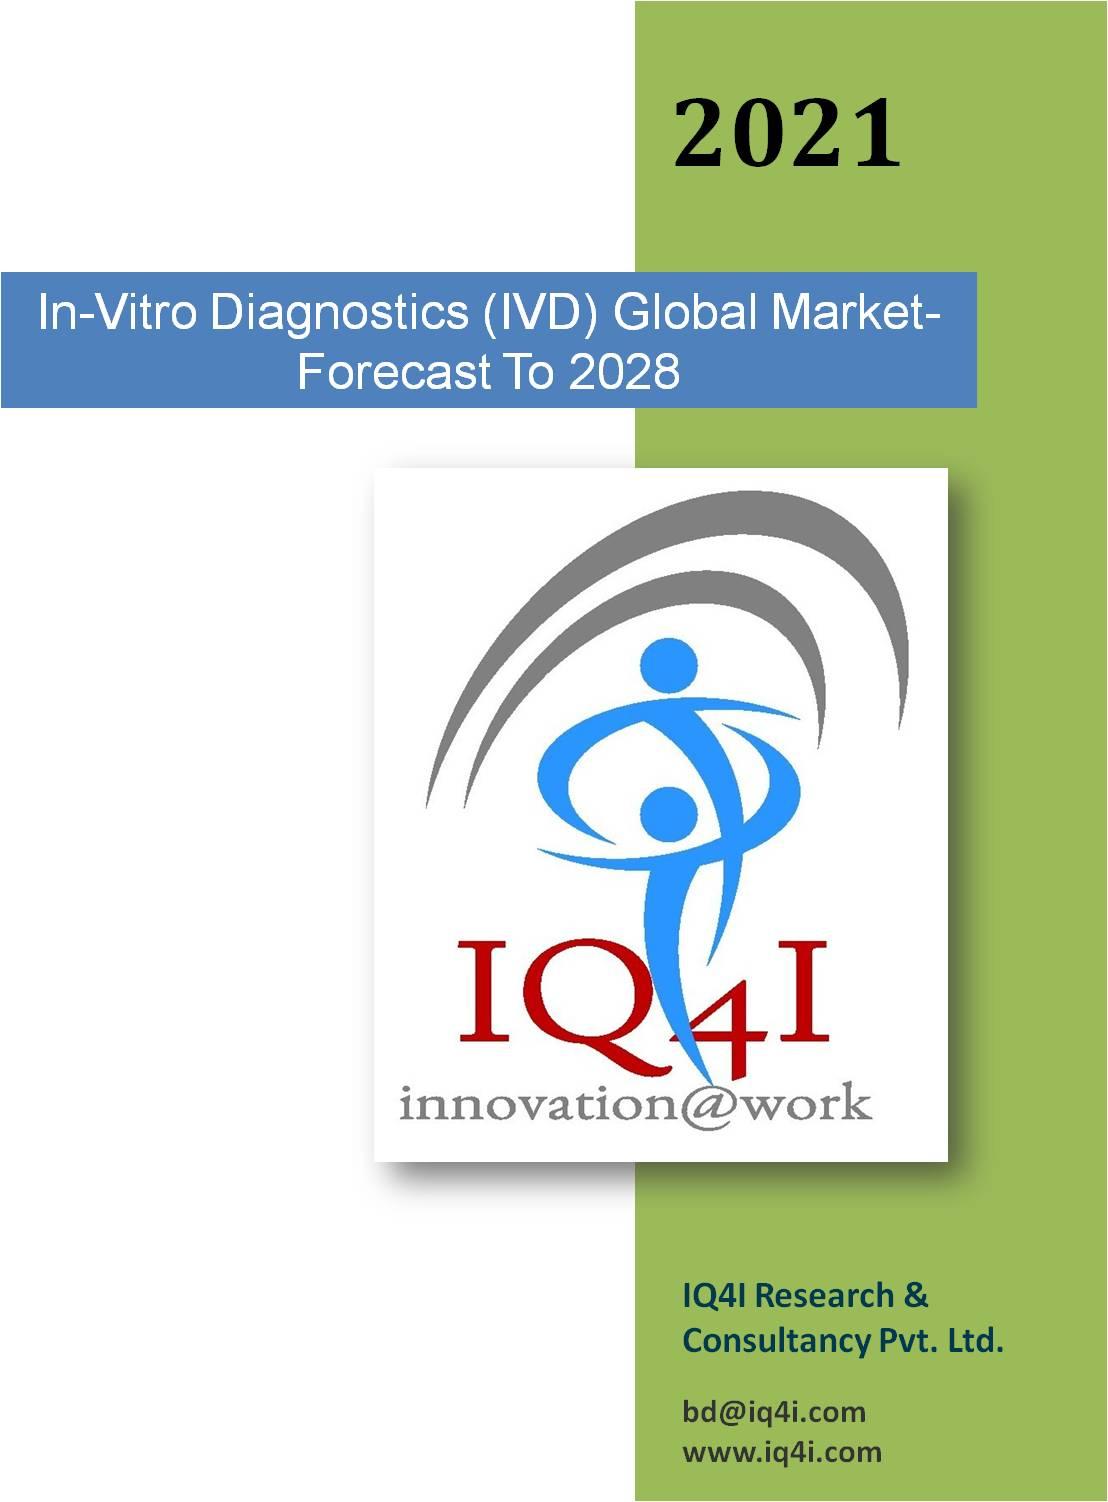 In Vitro Diagnostics Global market - Forecast to 2028